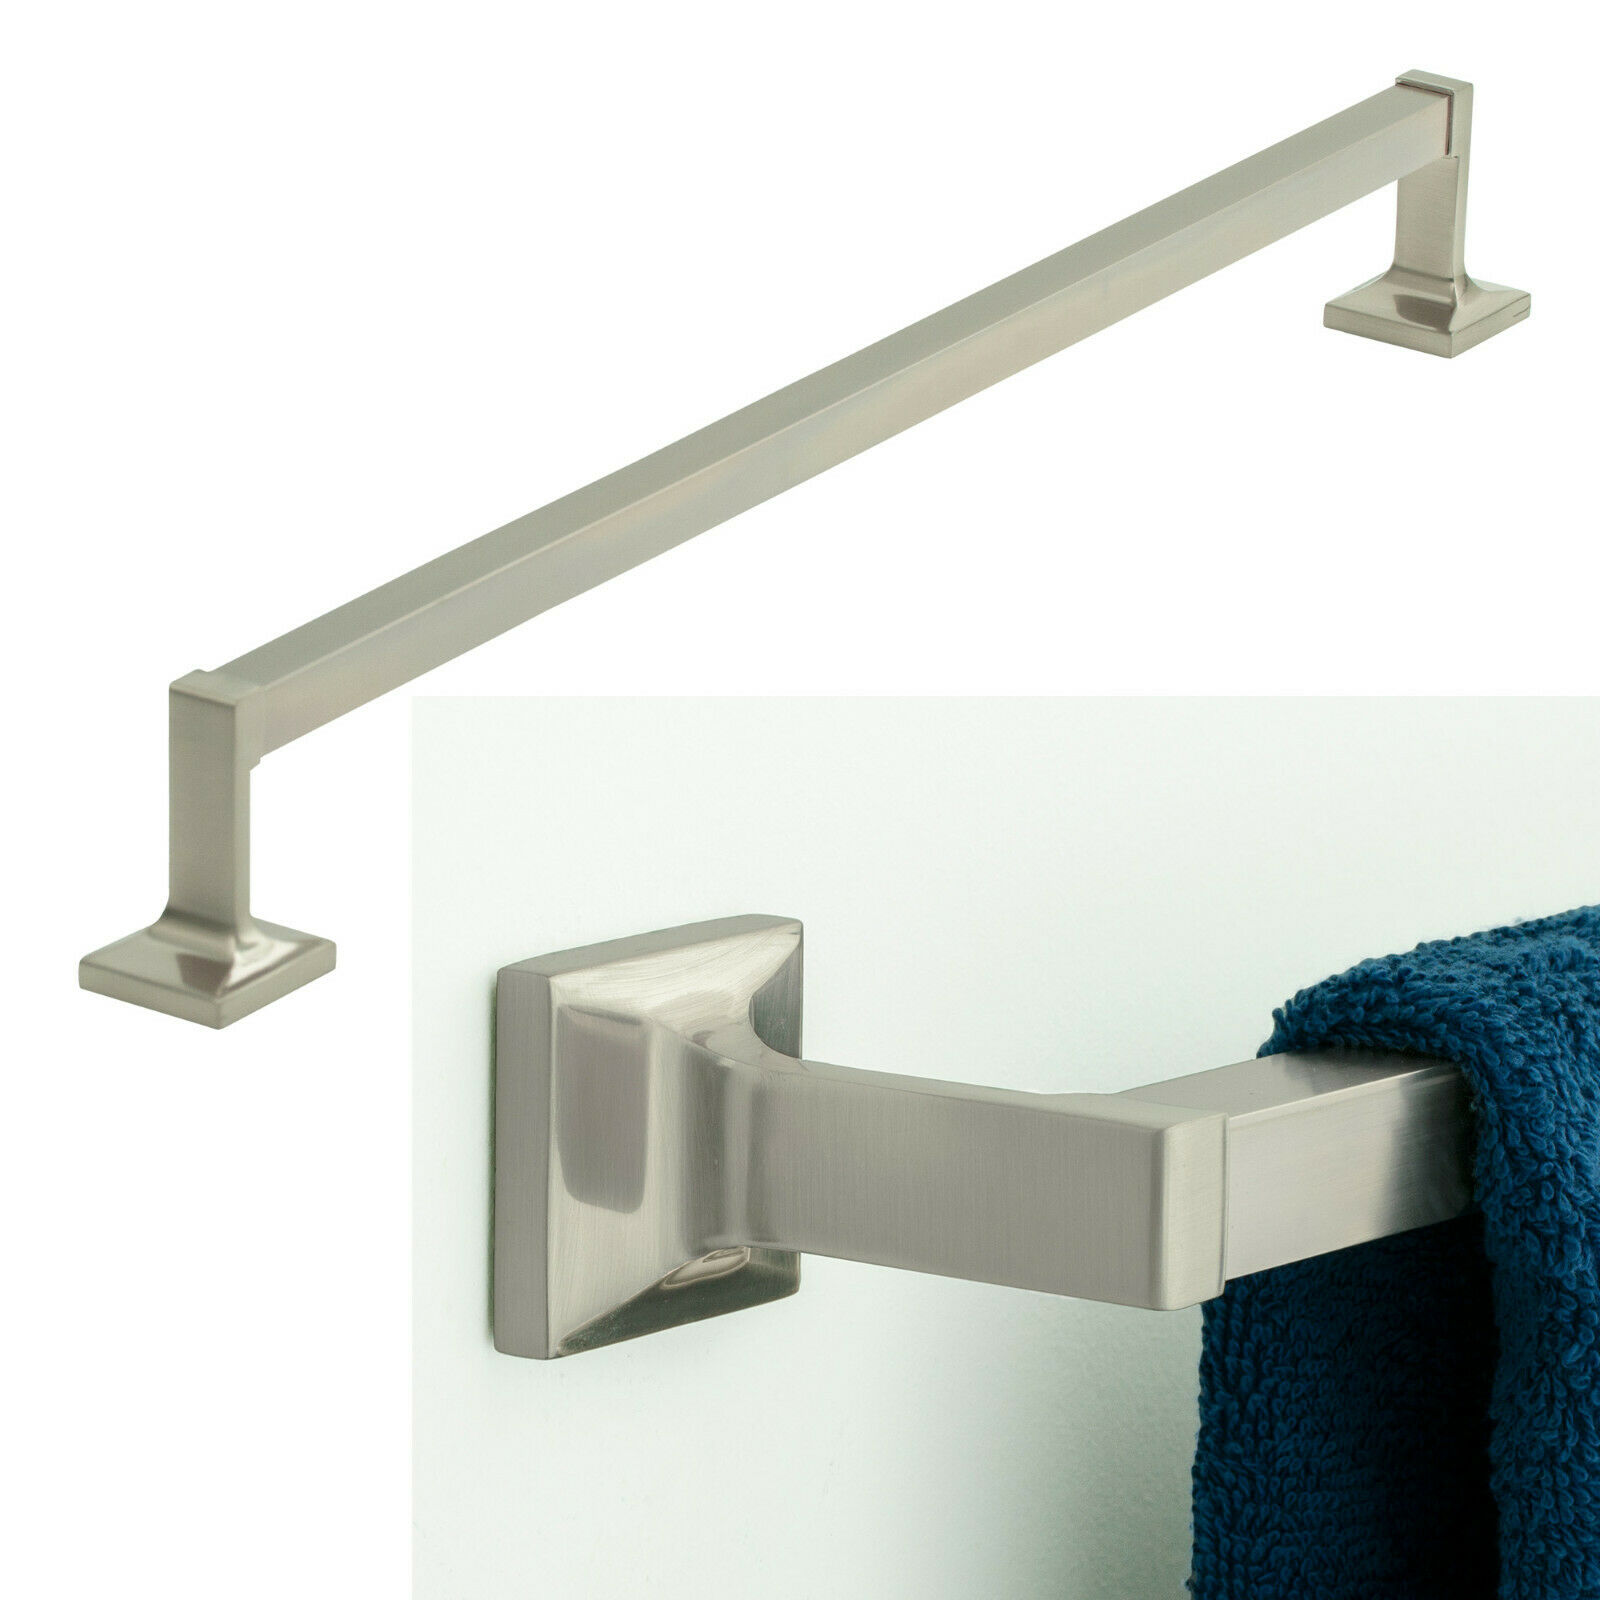 Redwood Series 24″ Towel Bar Bath Hardware Bathroom Accessory, Brushed Nickel Bath